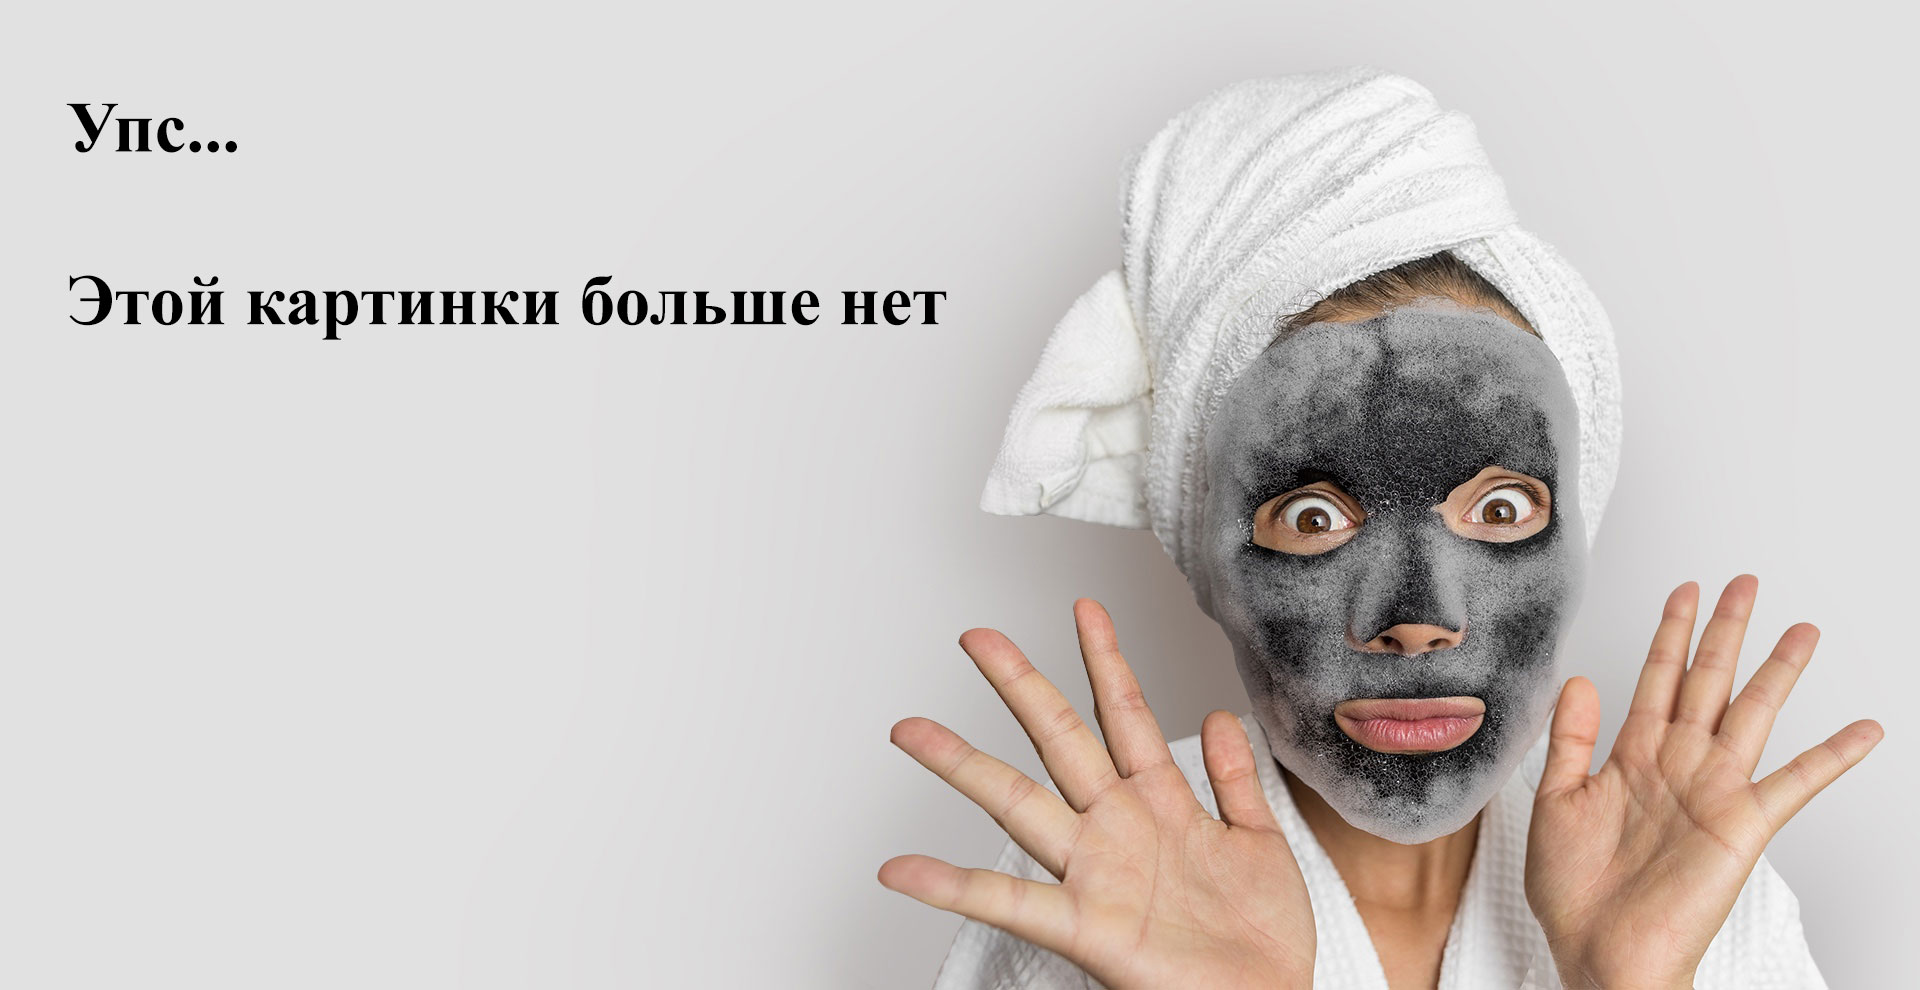 Vogue Nails, Гель-лак Текила санрайз